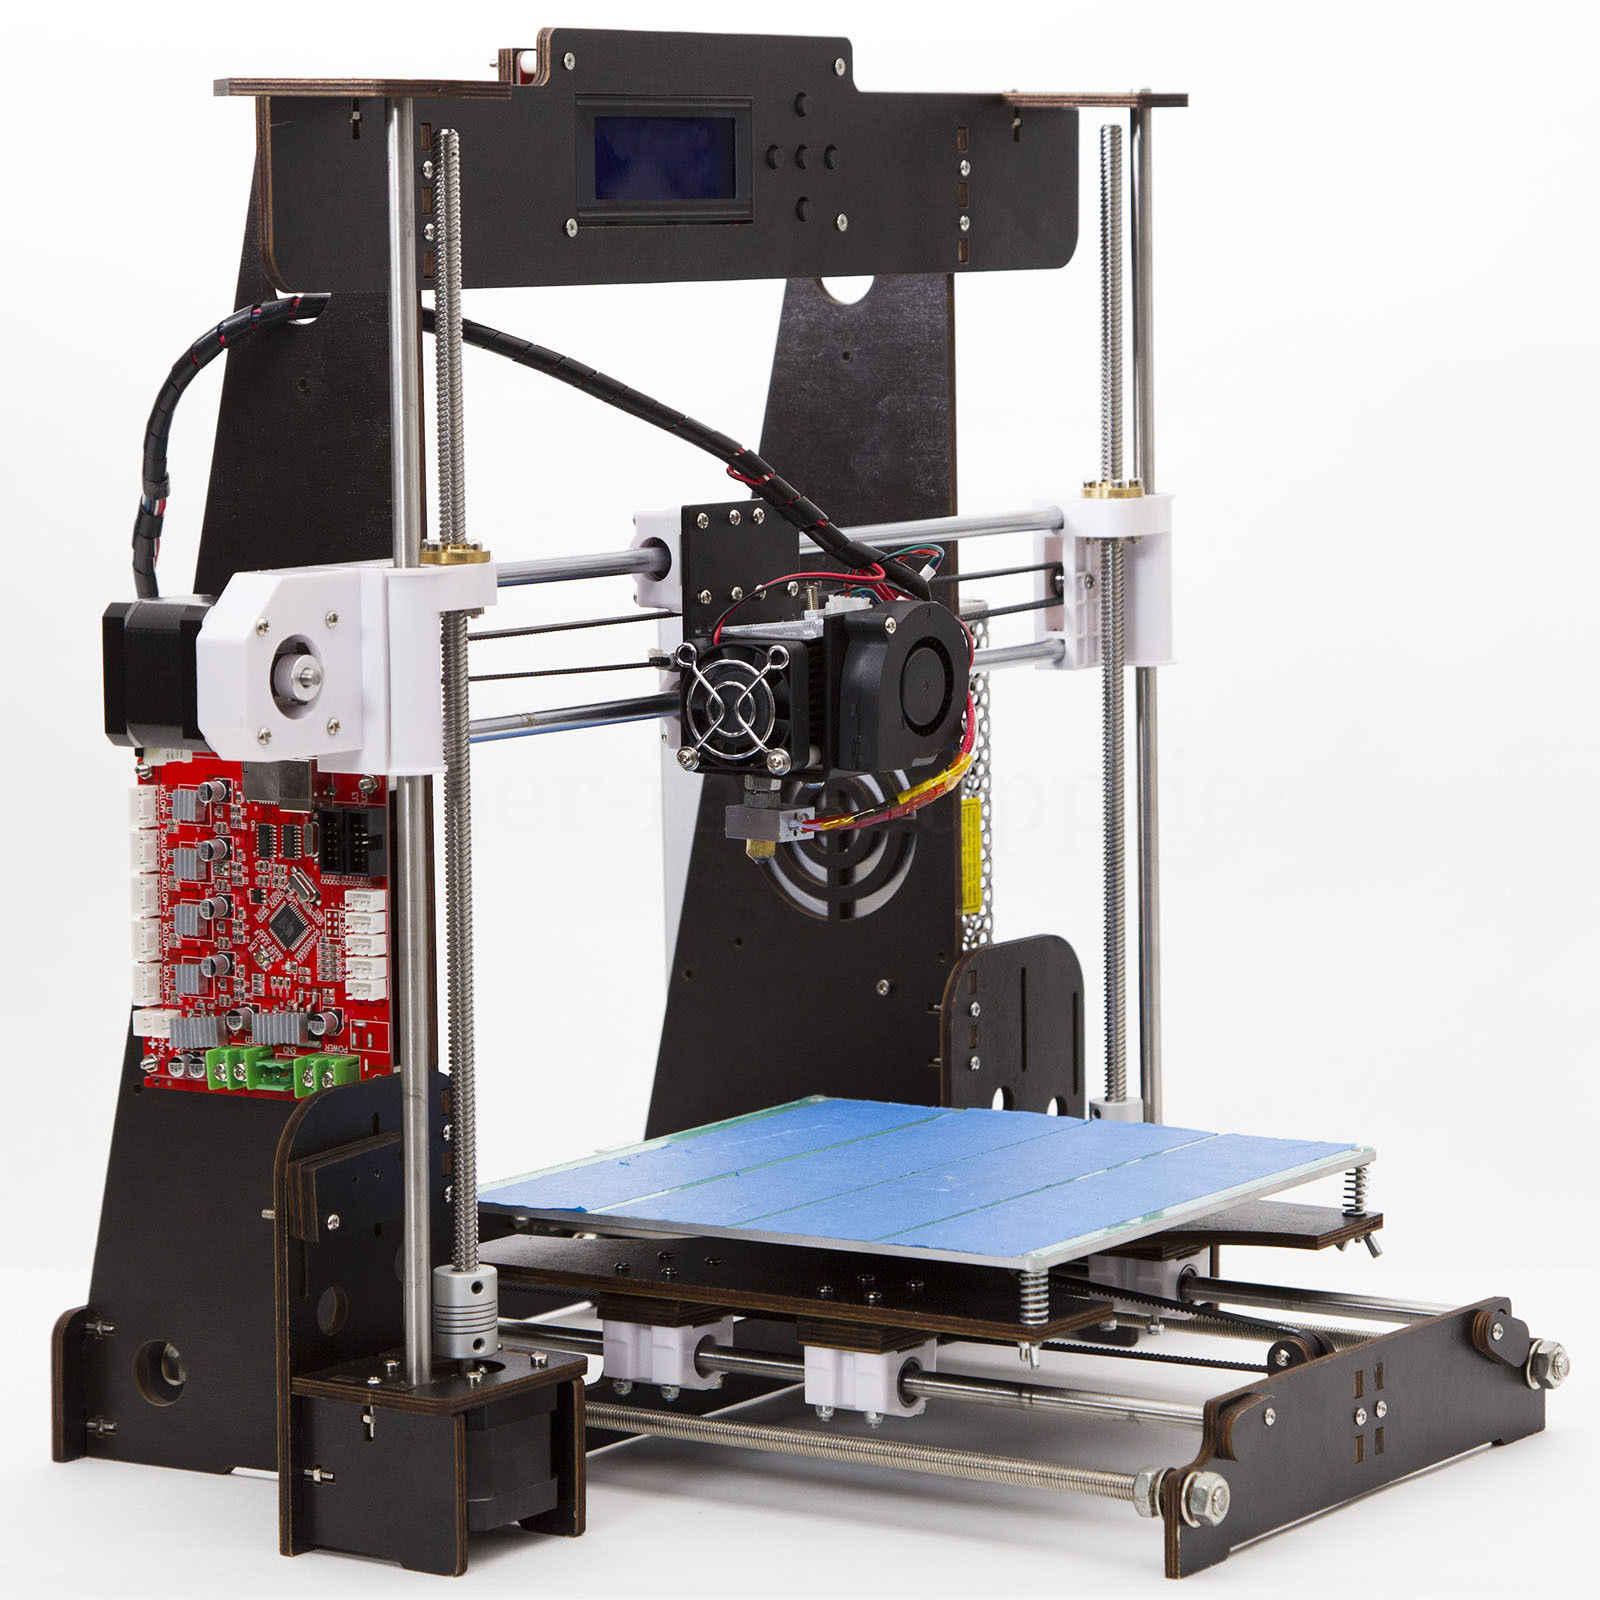 CTC A8 i3 Impresora 3D, Impresora de alta precisión, Impresora 3D DIY